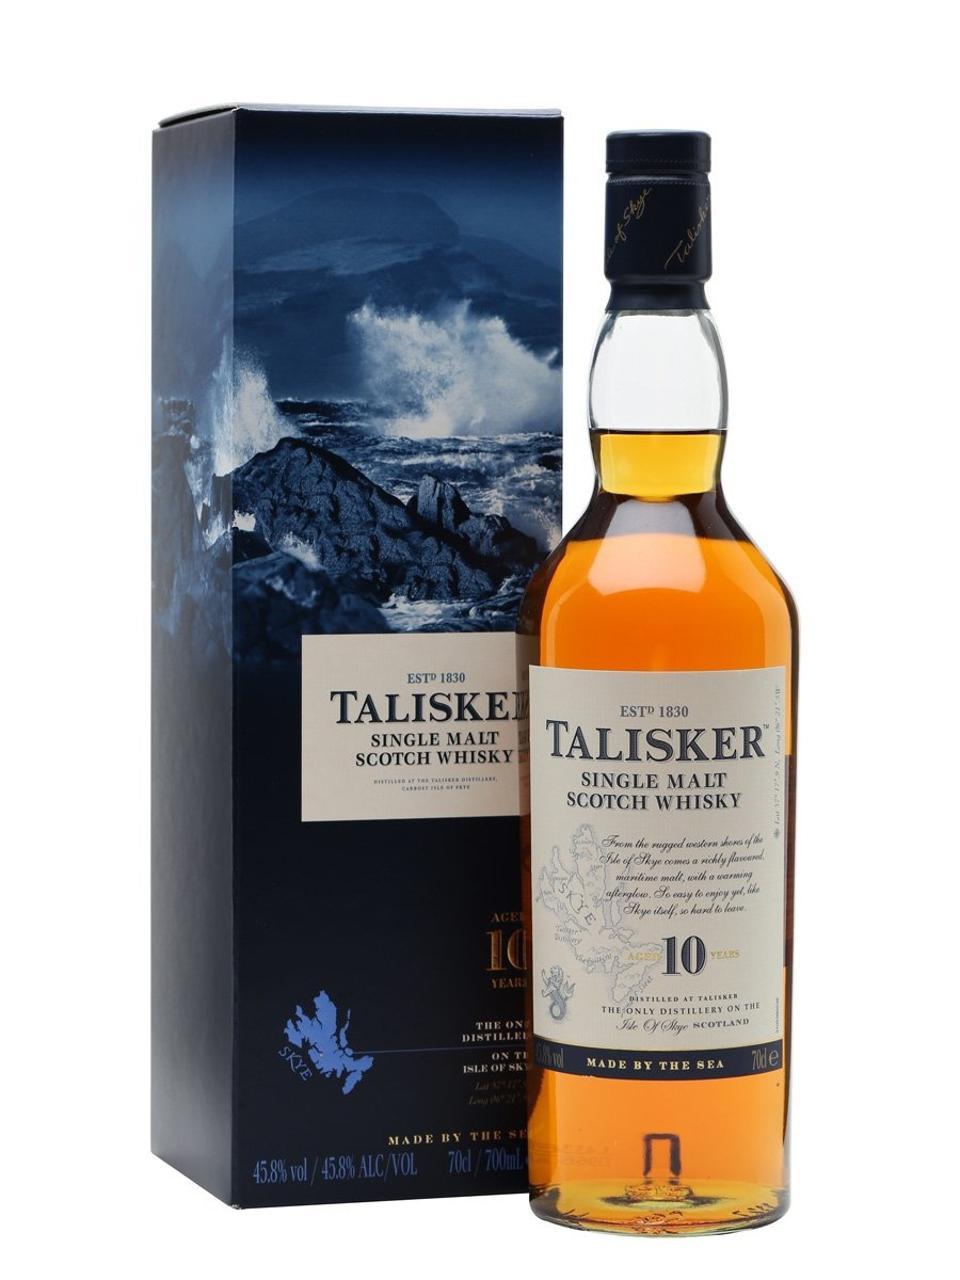 Talisker 10 YO, whisky écossais single malt